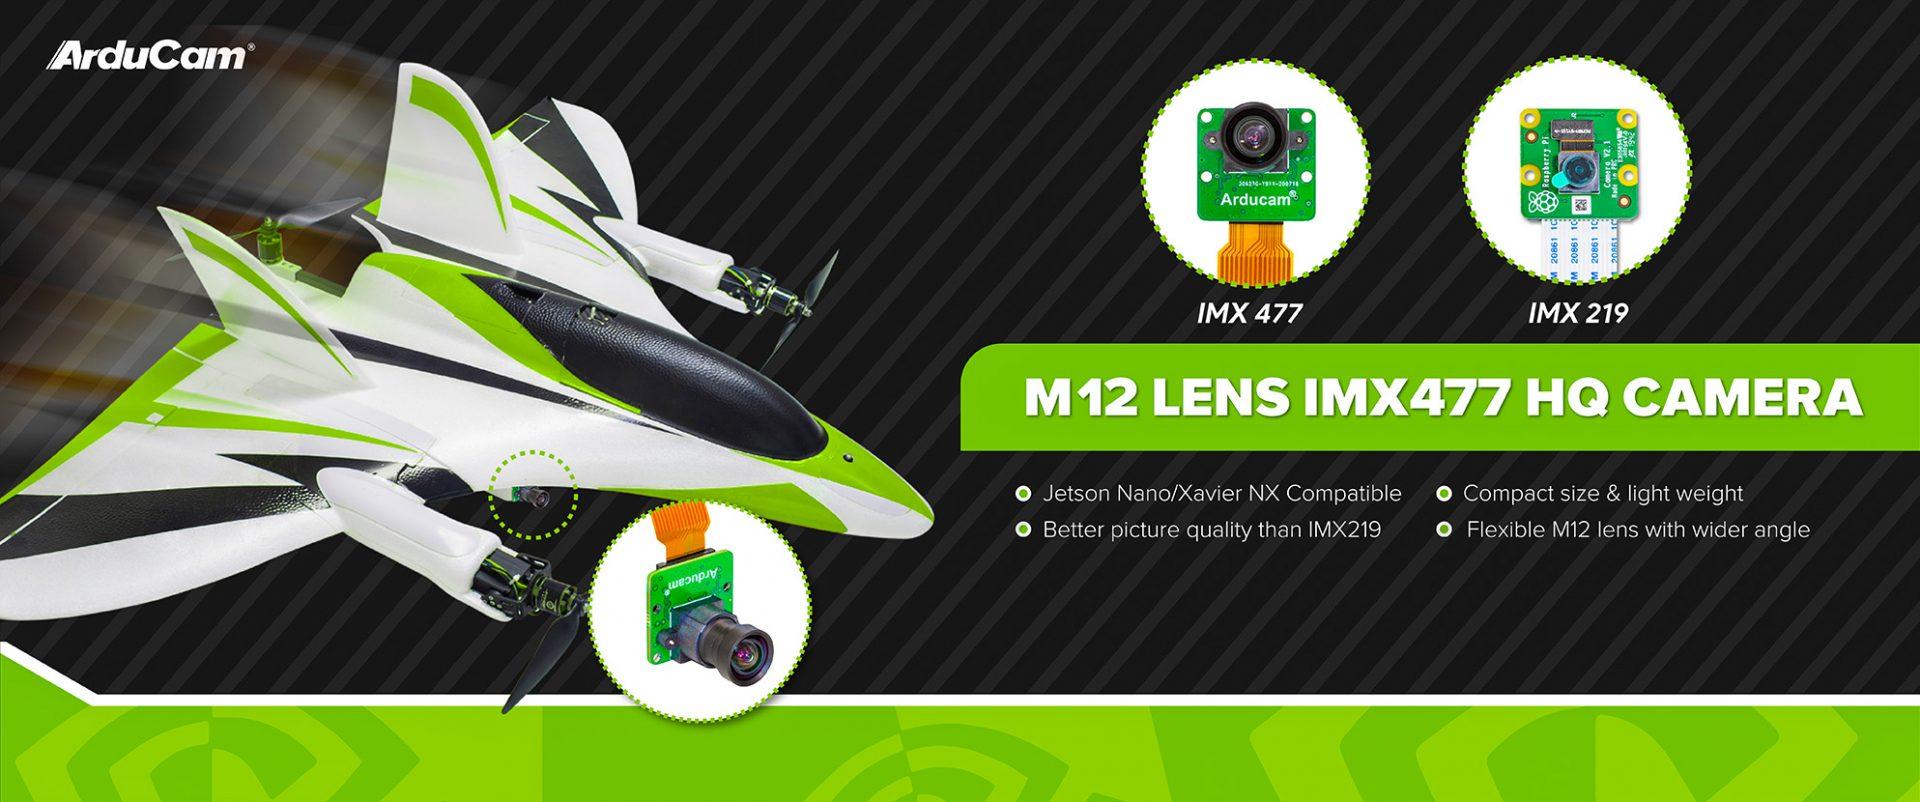 arducam mini IMX 477 camera and m12 lens bundle